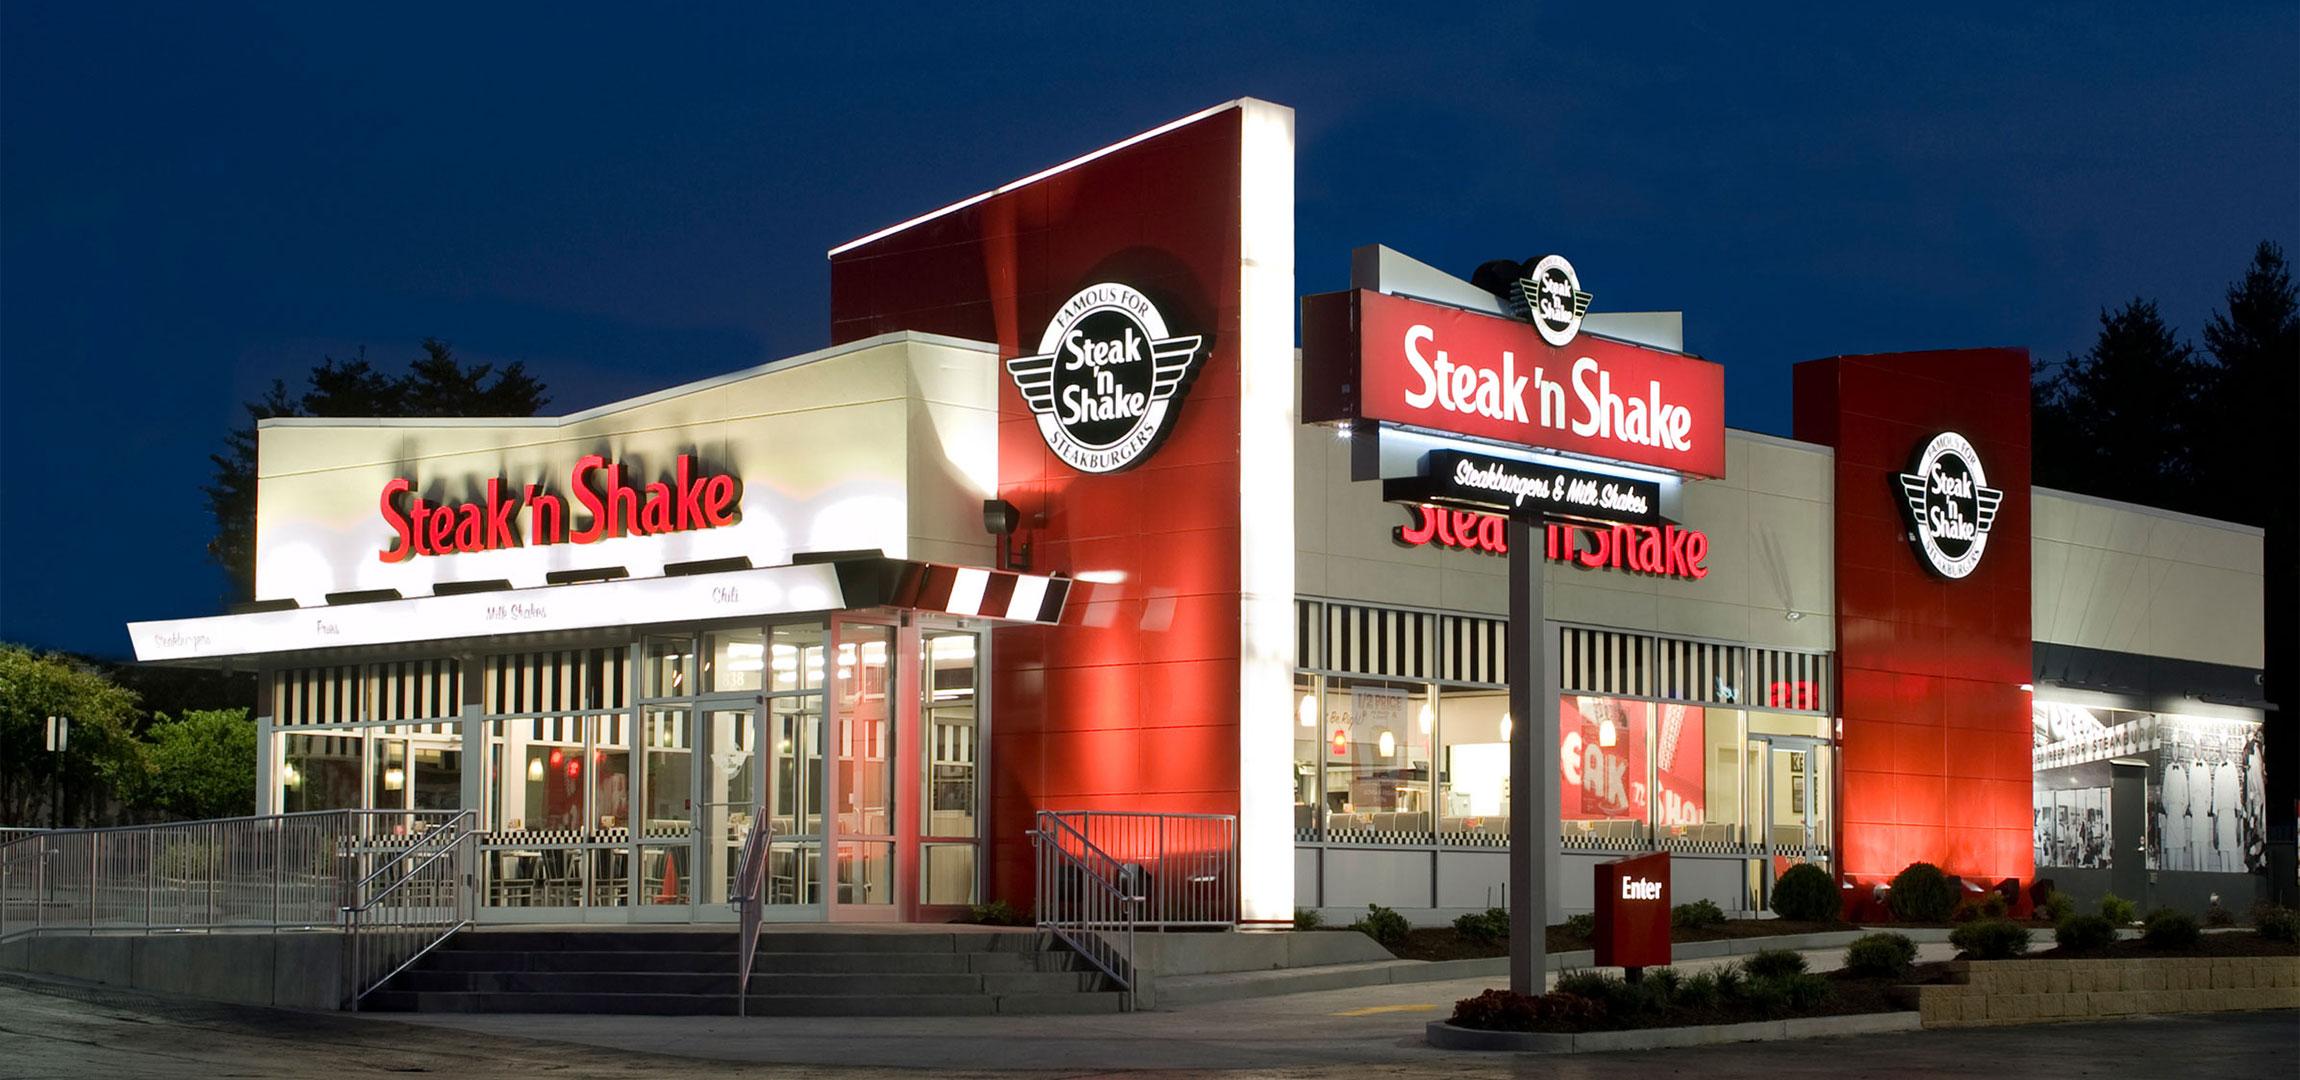 Steak 'n Shake – We Are Hiring KC